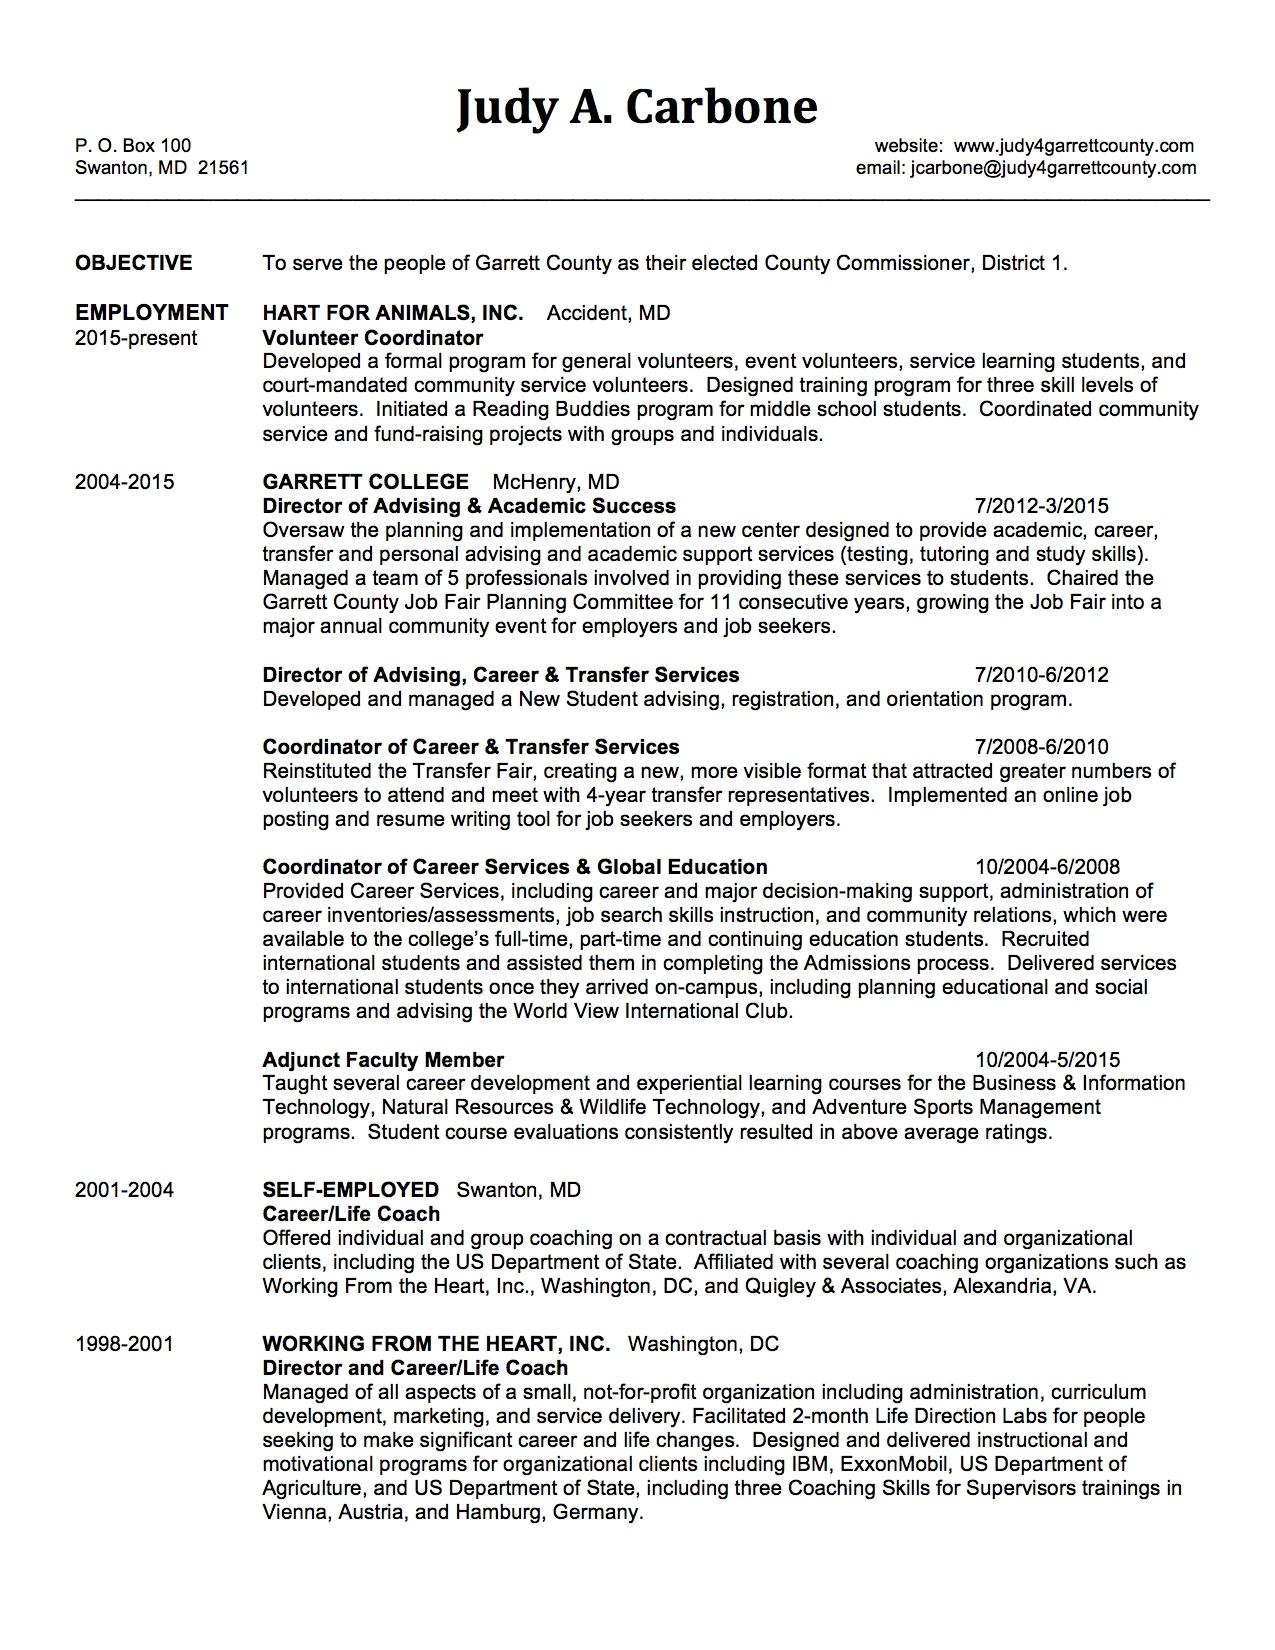 judy carbone Candidate Resume.jpg